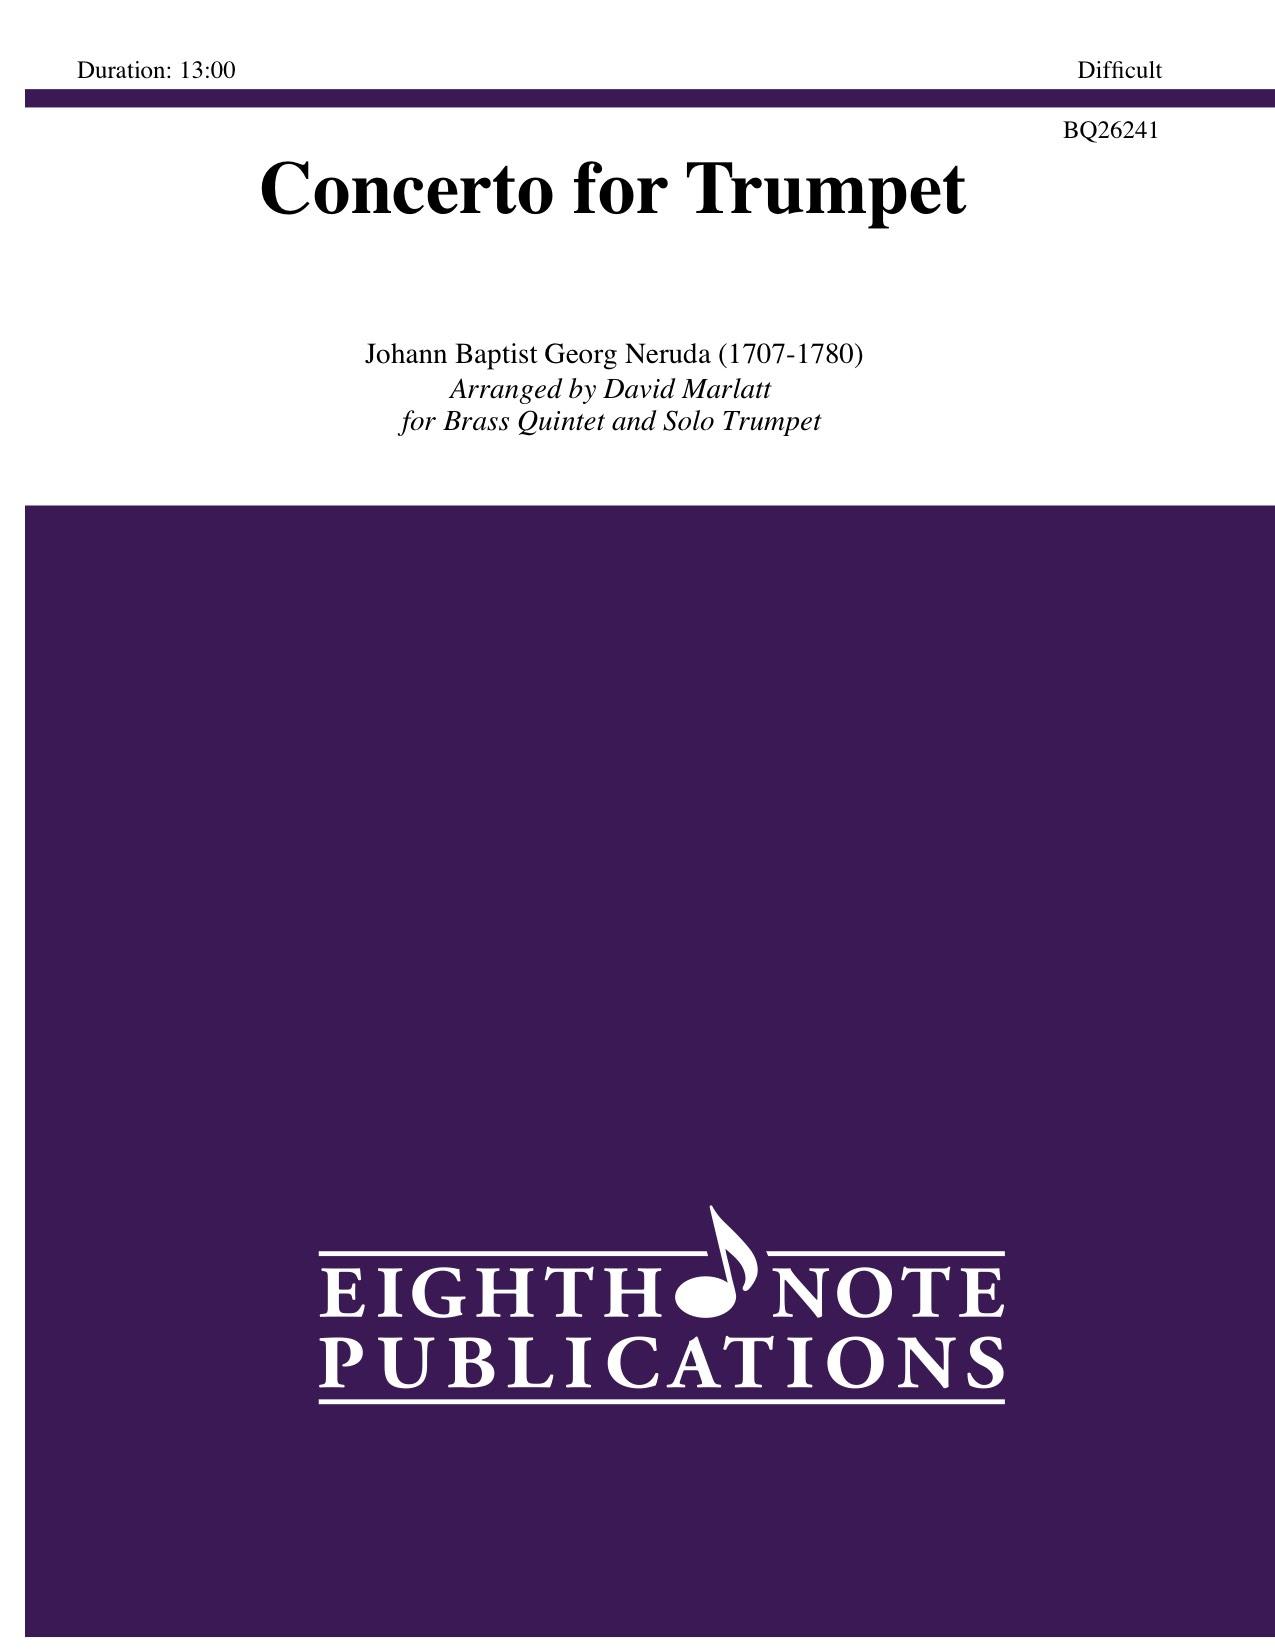 Concerto for Trumpet - Johann Baptist Georg Neruda